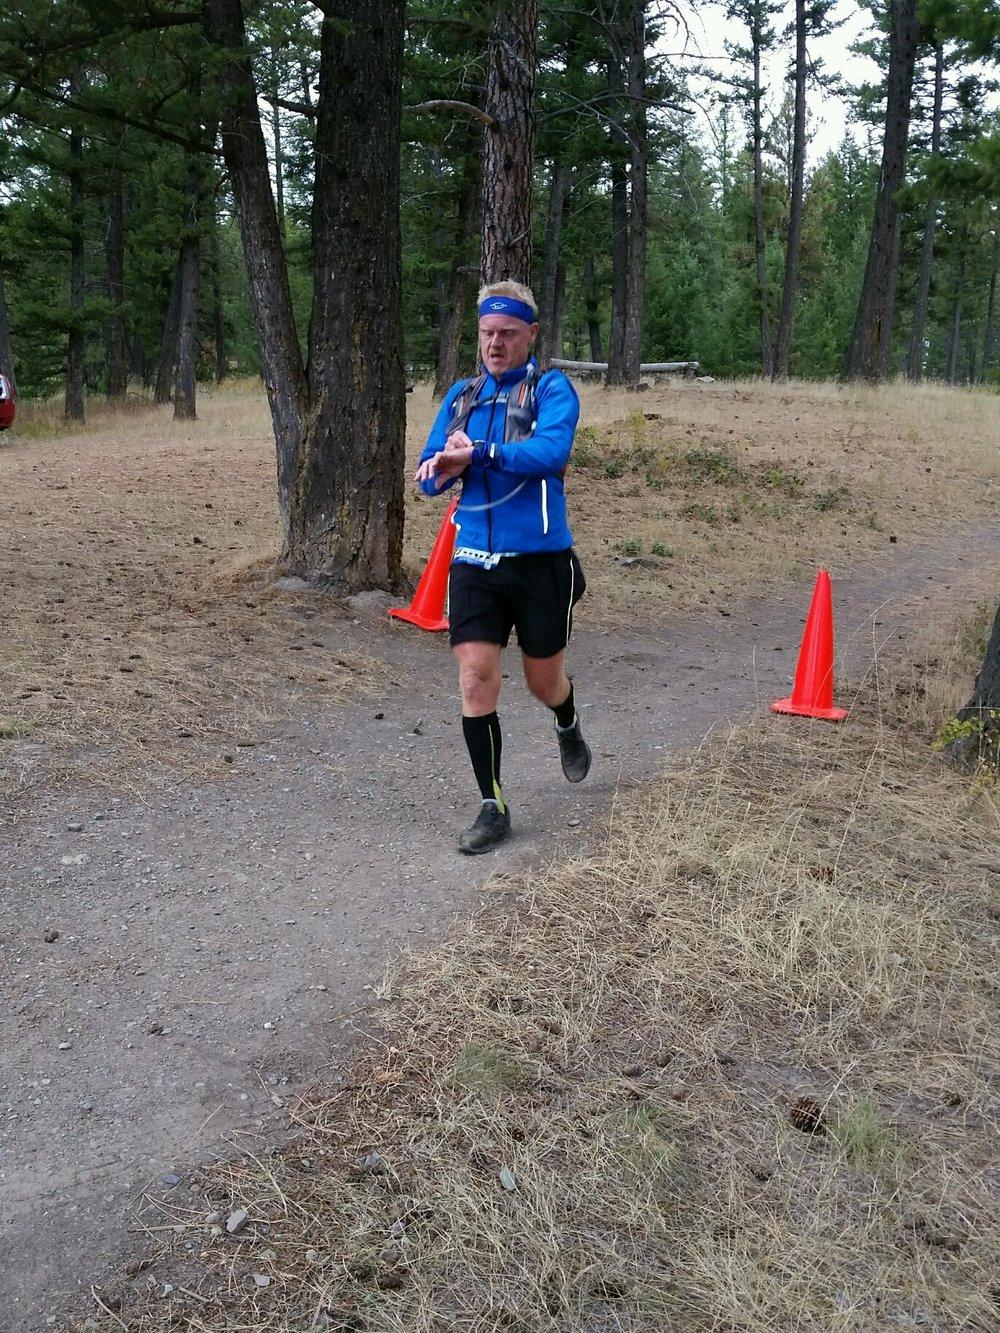 foys to blacktail trails trail marathon ftbtIMG_1770.JPG